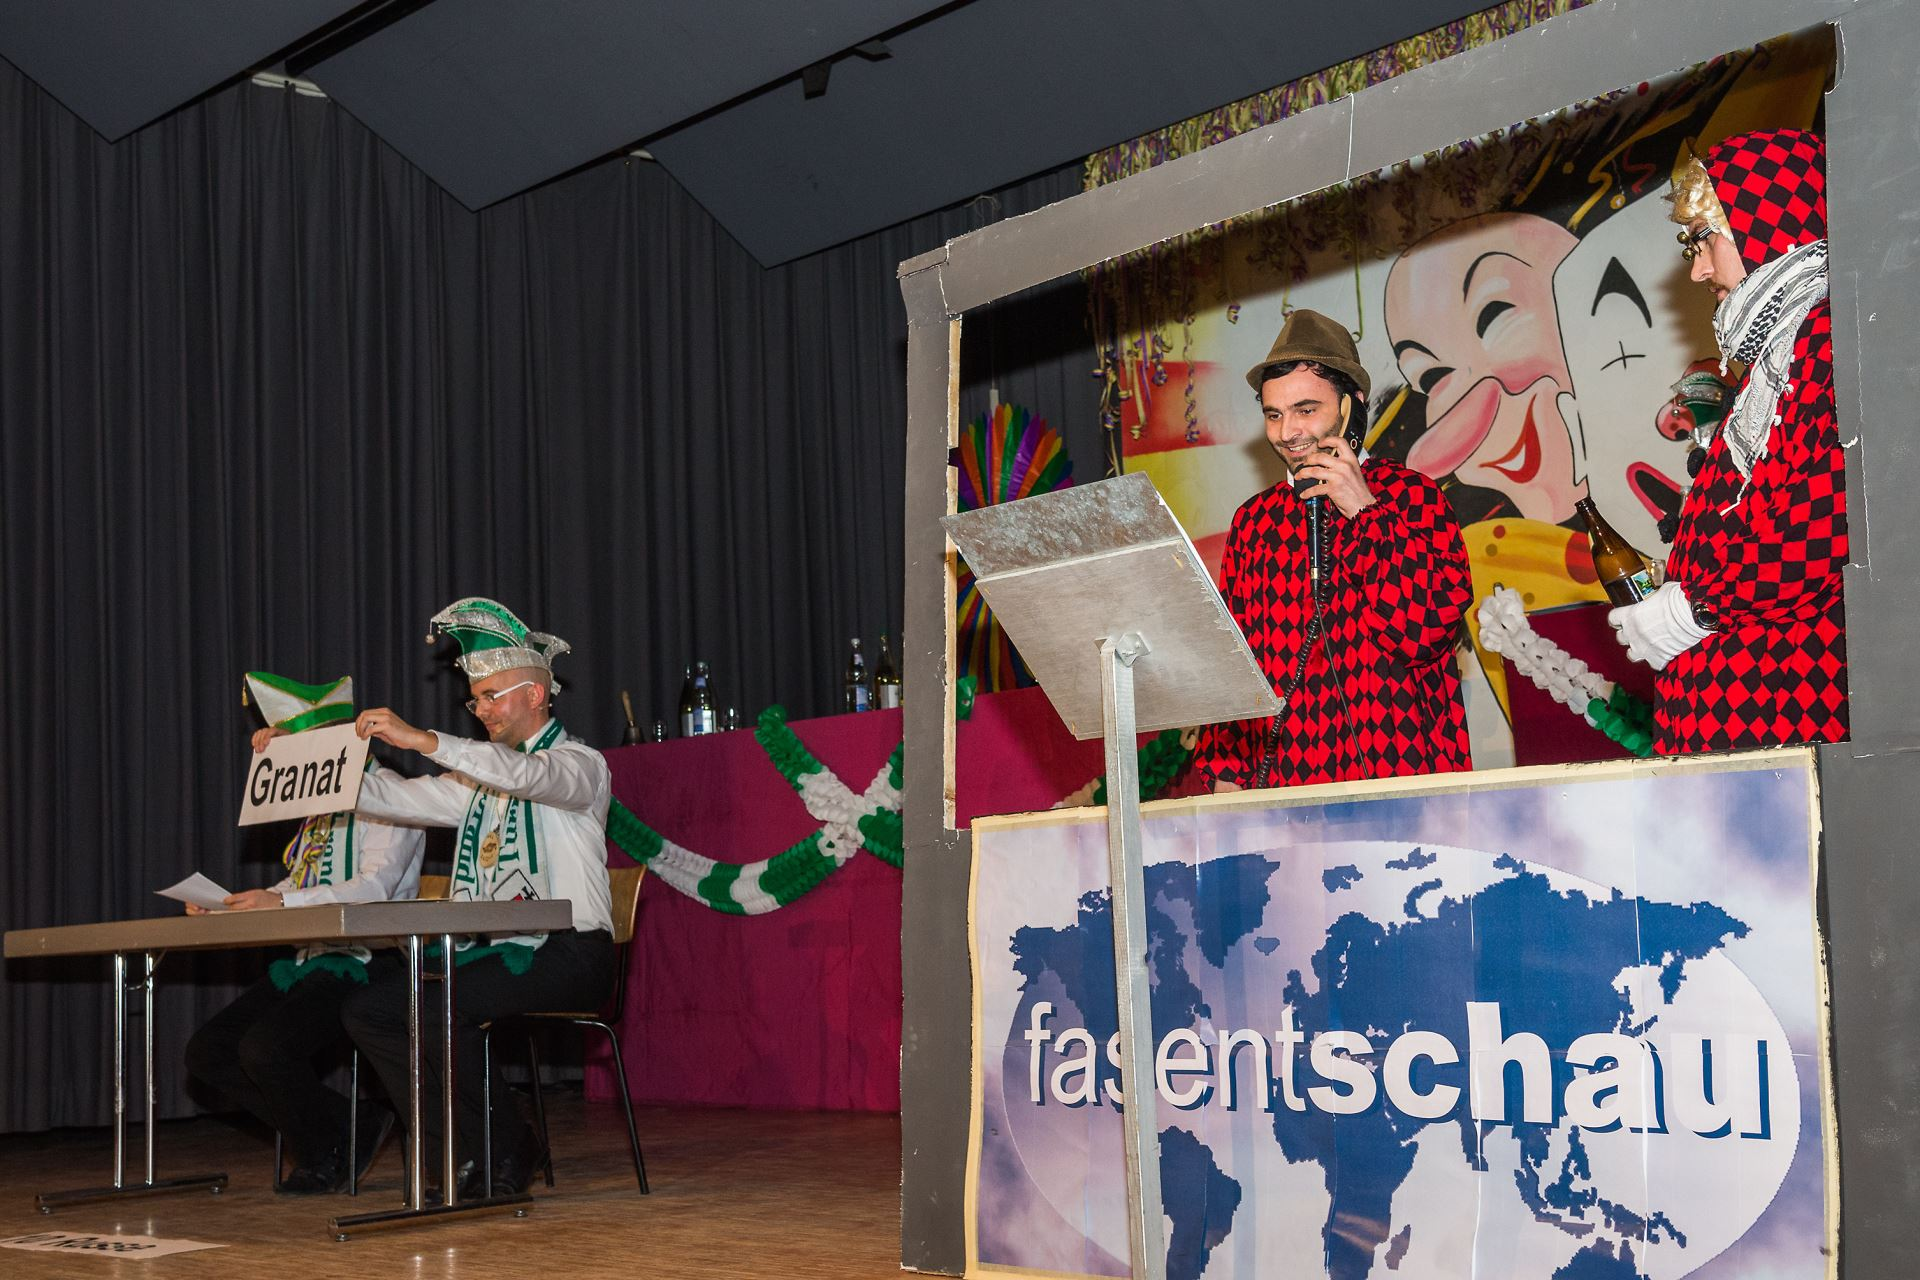 Fasentsitzung in Langenbrand 2014 (028)